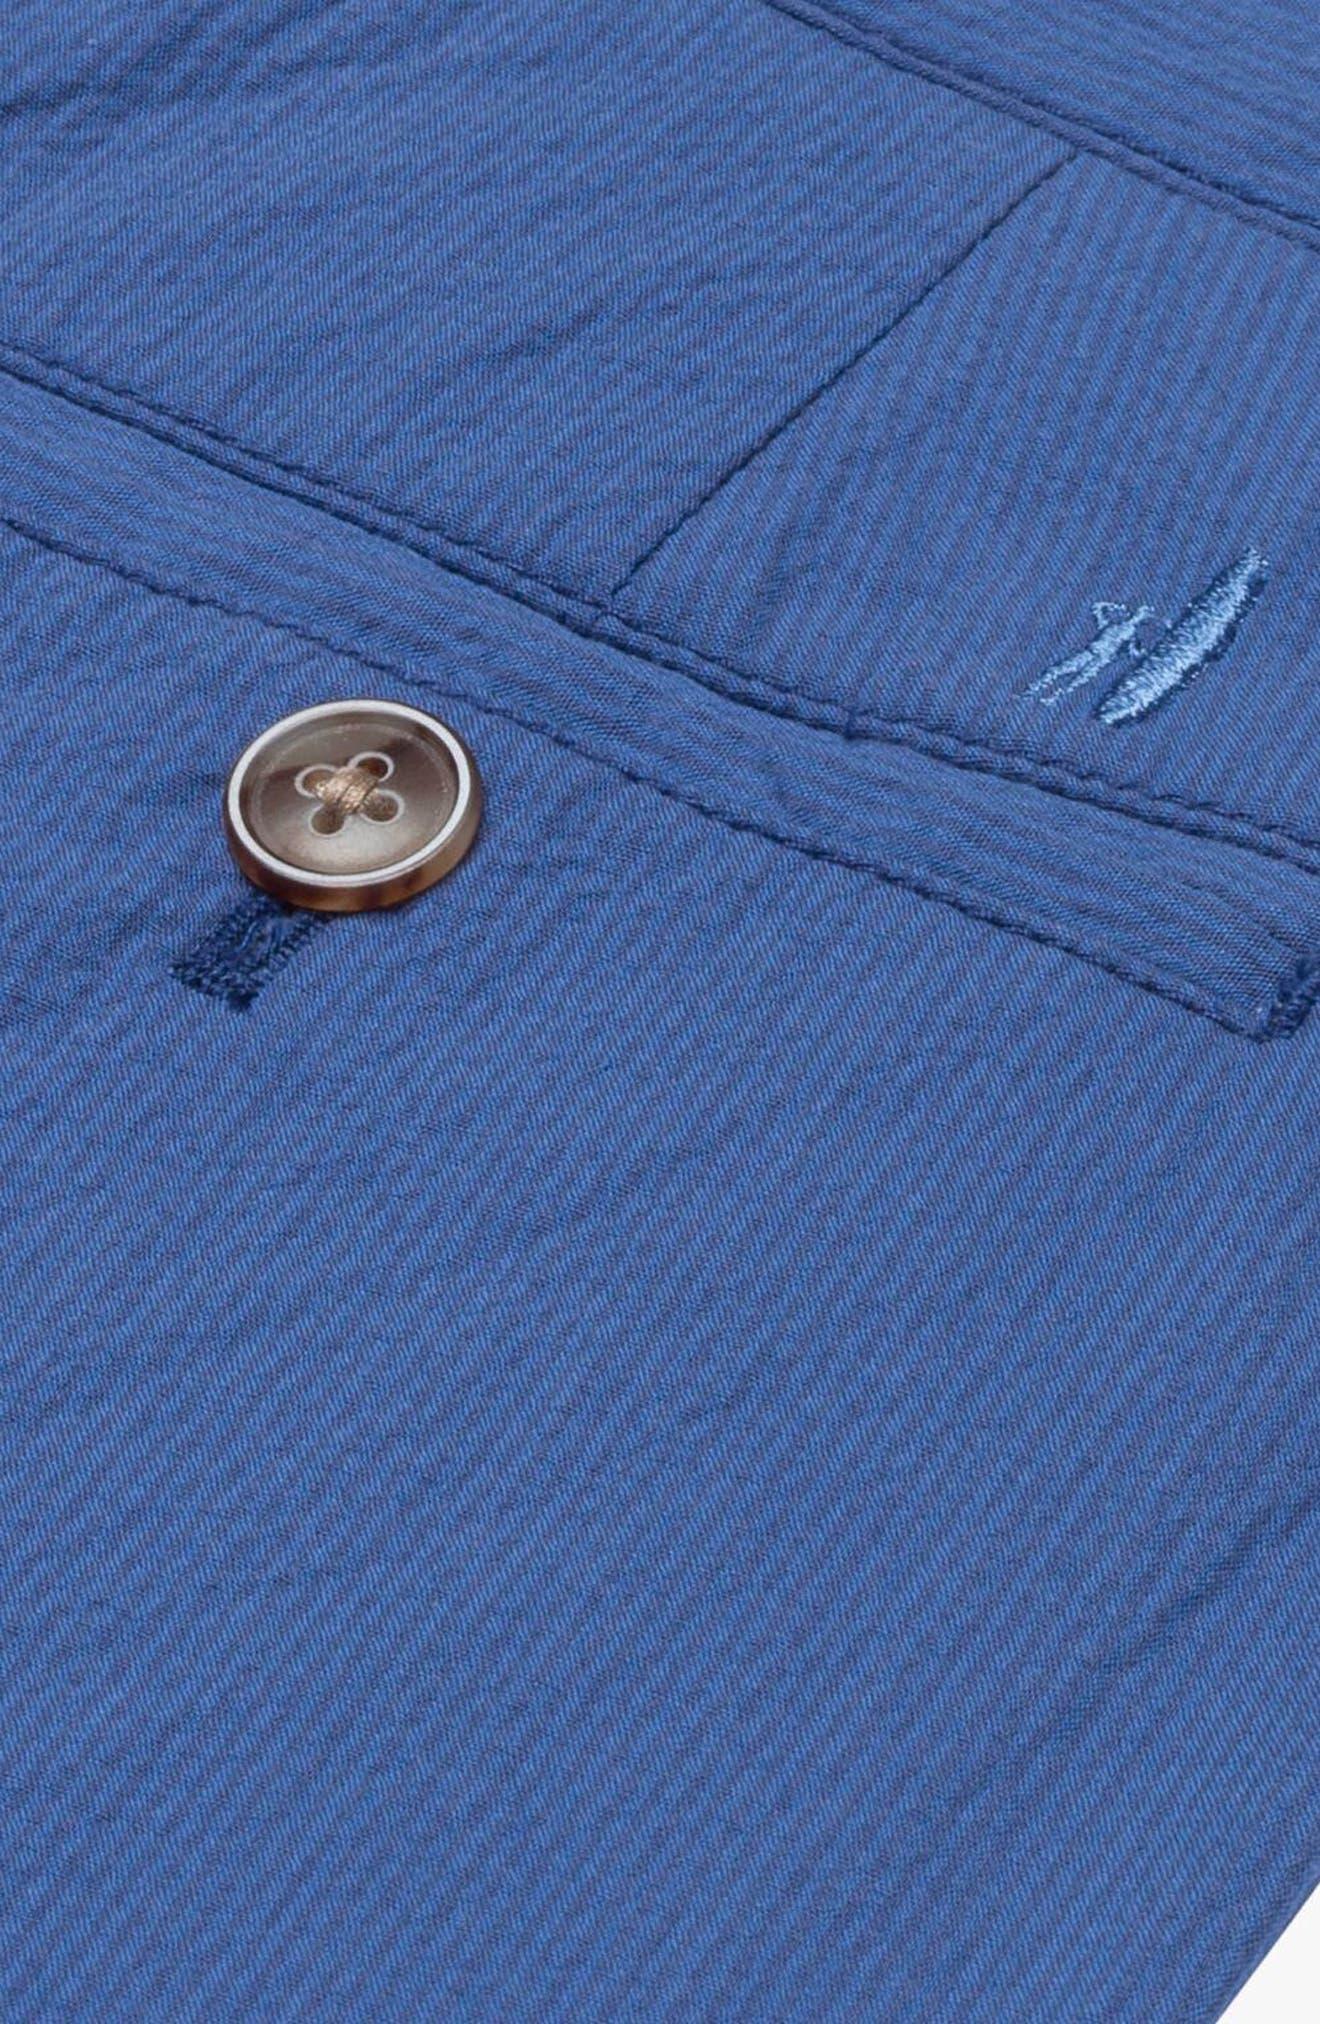 Bryson Seersucker Shorts,                             Alternate thumbnail 2, color,                             Ripple